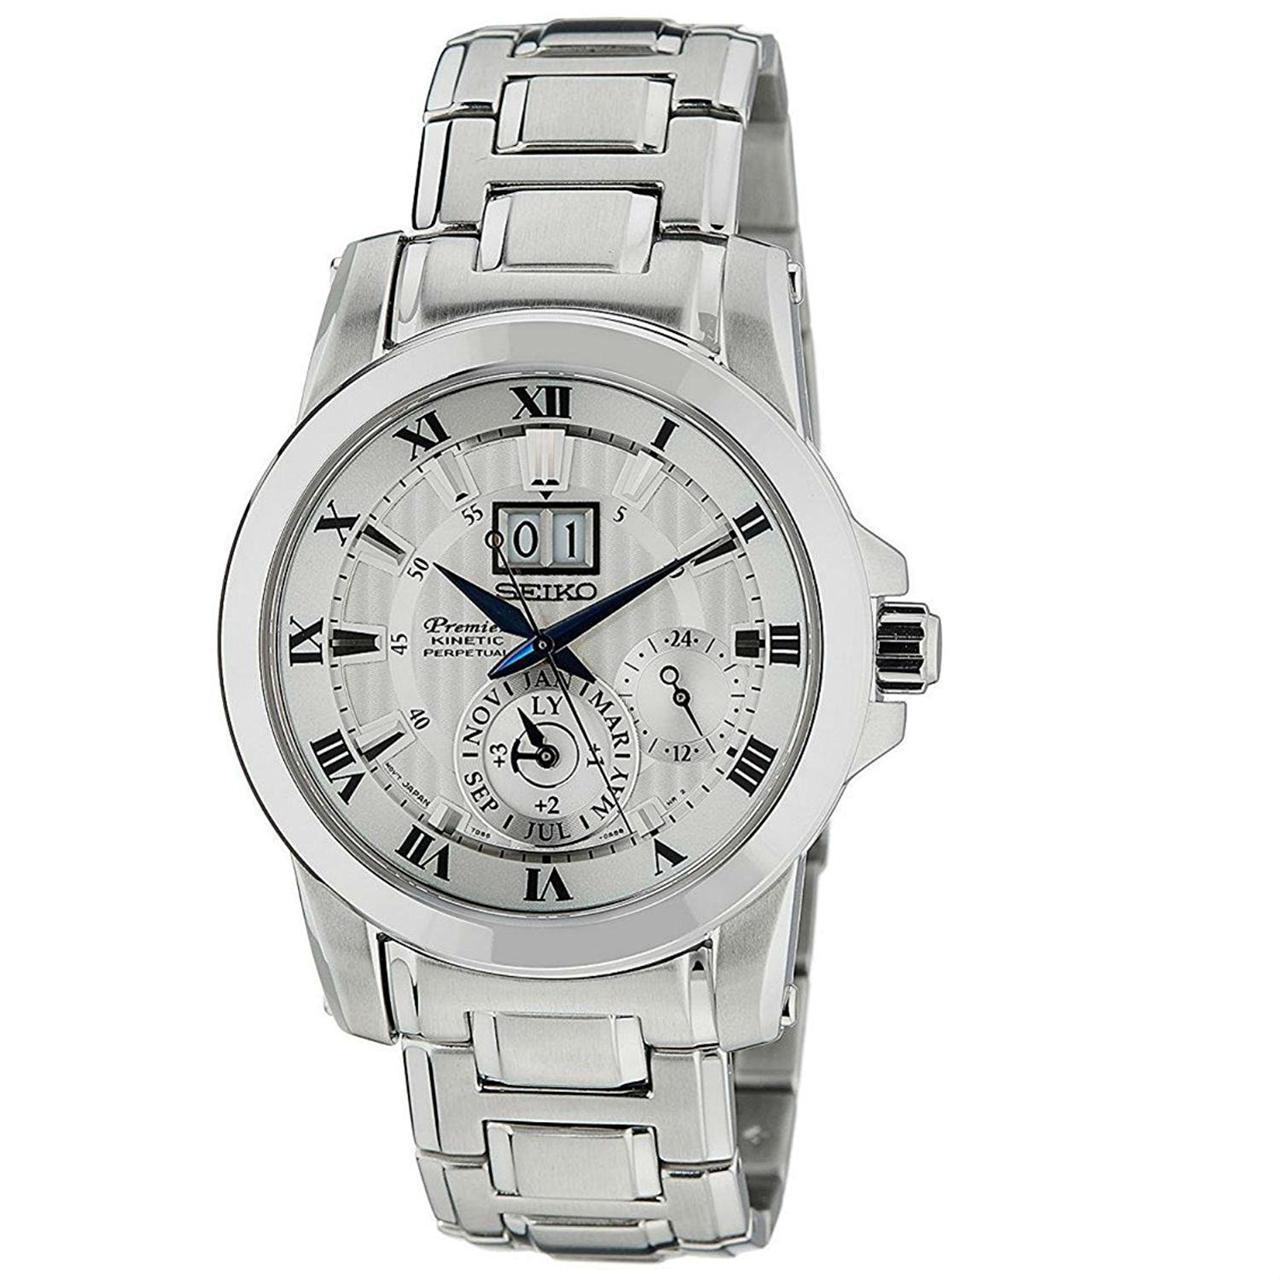 Мужские часы Seiko SNP091P1 Premier Kinetic Perpetual